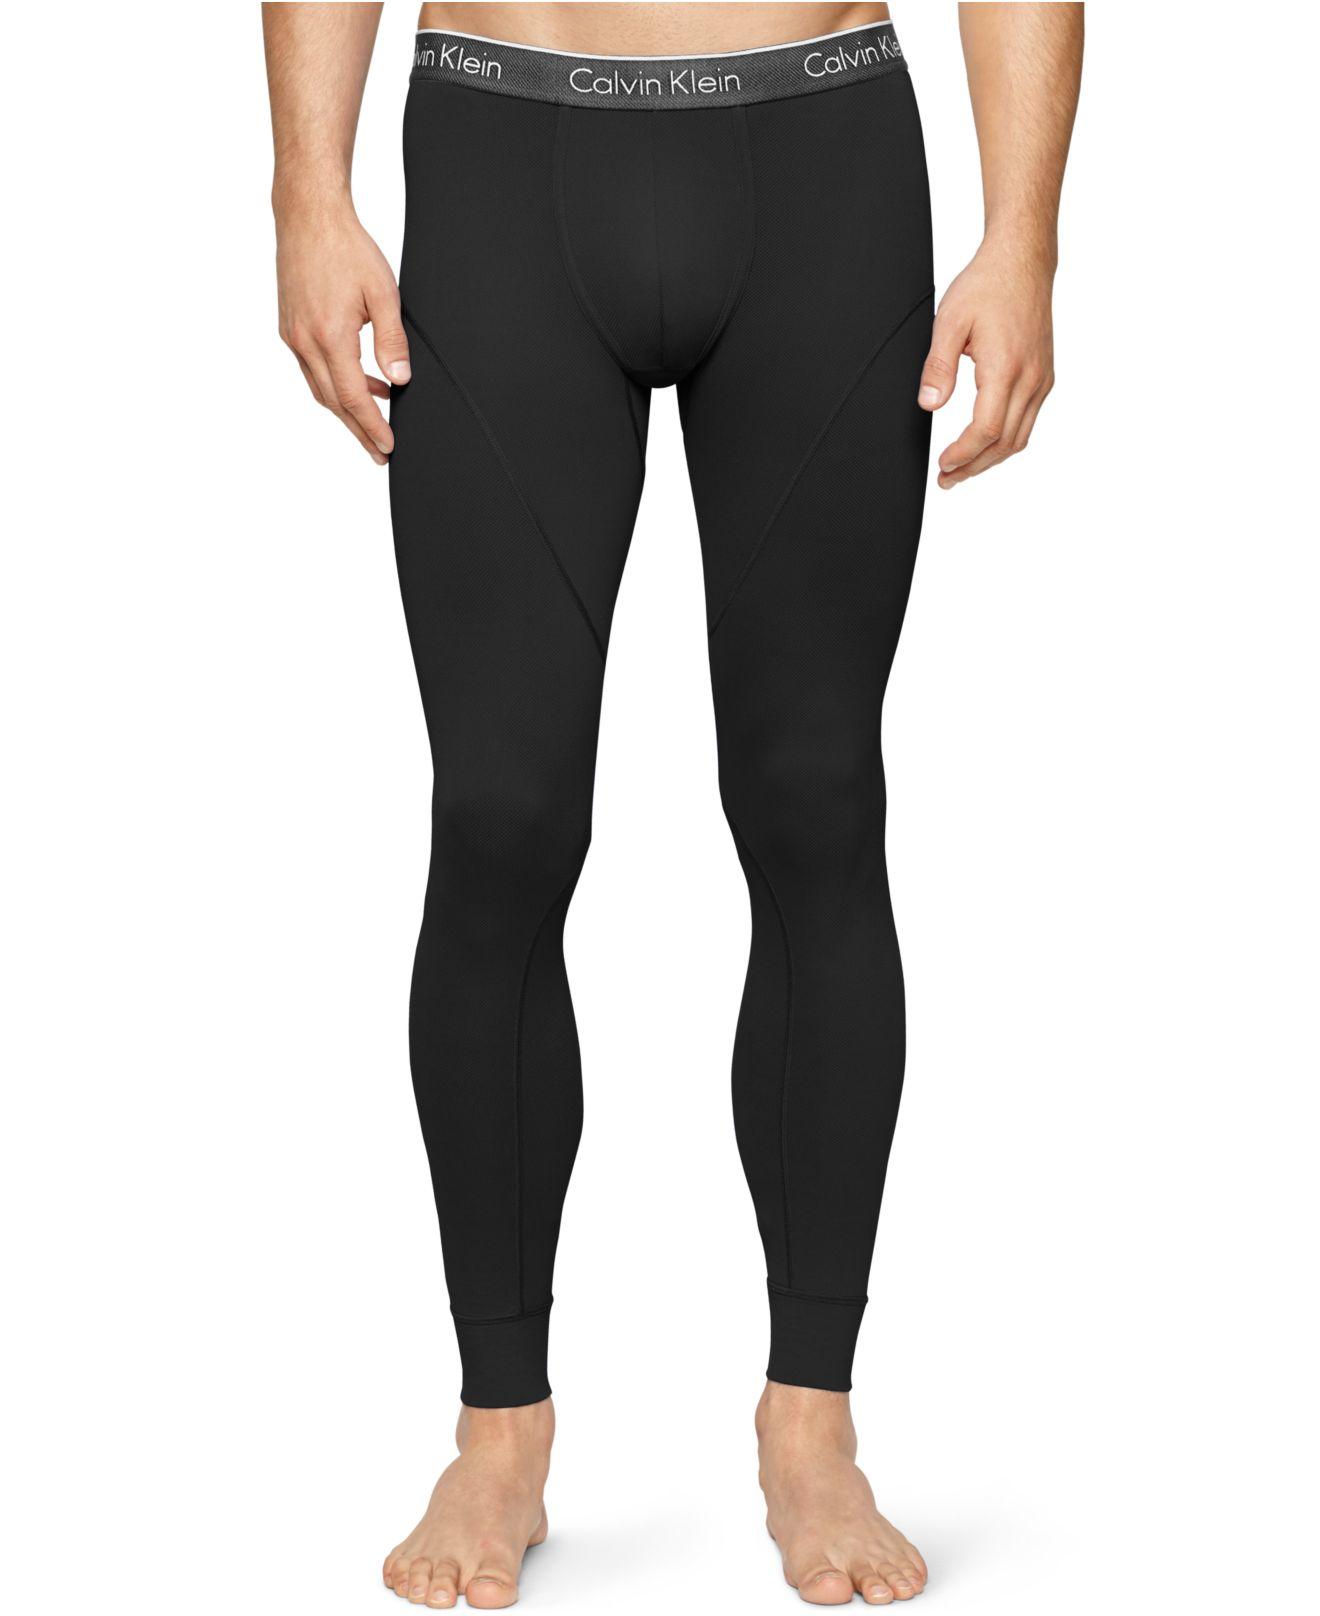 calvin klein black air men 39 s leggings for men lyst. Black Bedroom Furniture Sets. Home Design Ideas